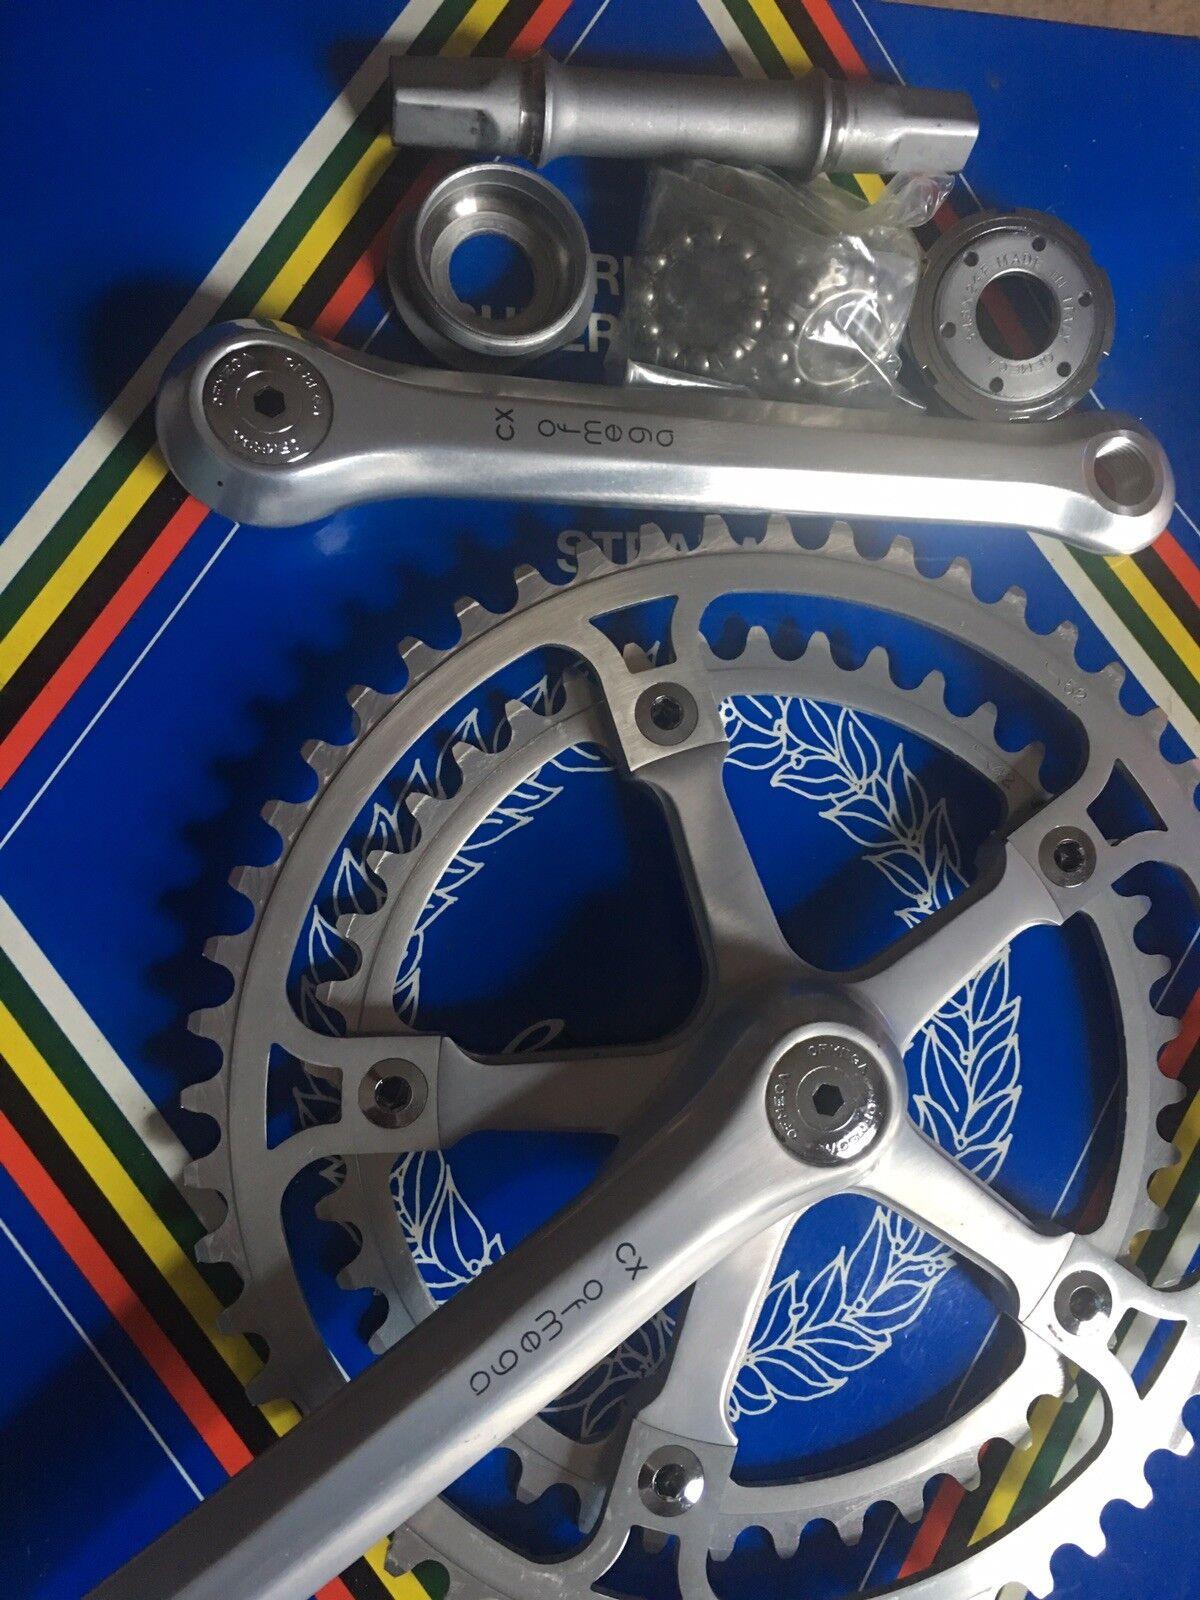 NOS CX Ofmega COLNAGO Road Bike Crankset 42 52T Double Vintage Bicycle 170mm